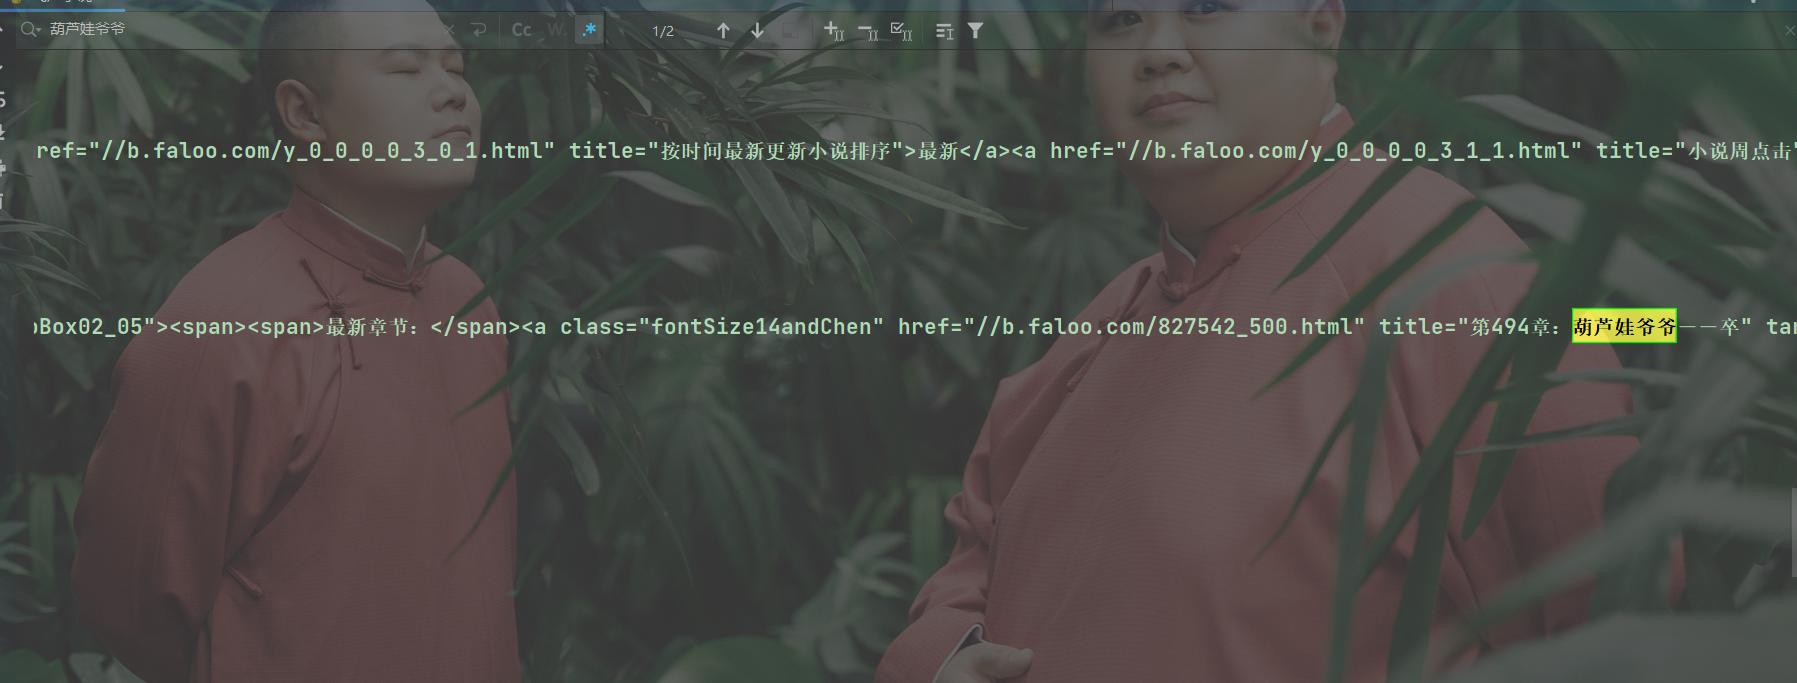 Python爬虫(2)-发送请求插图3